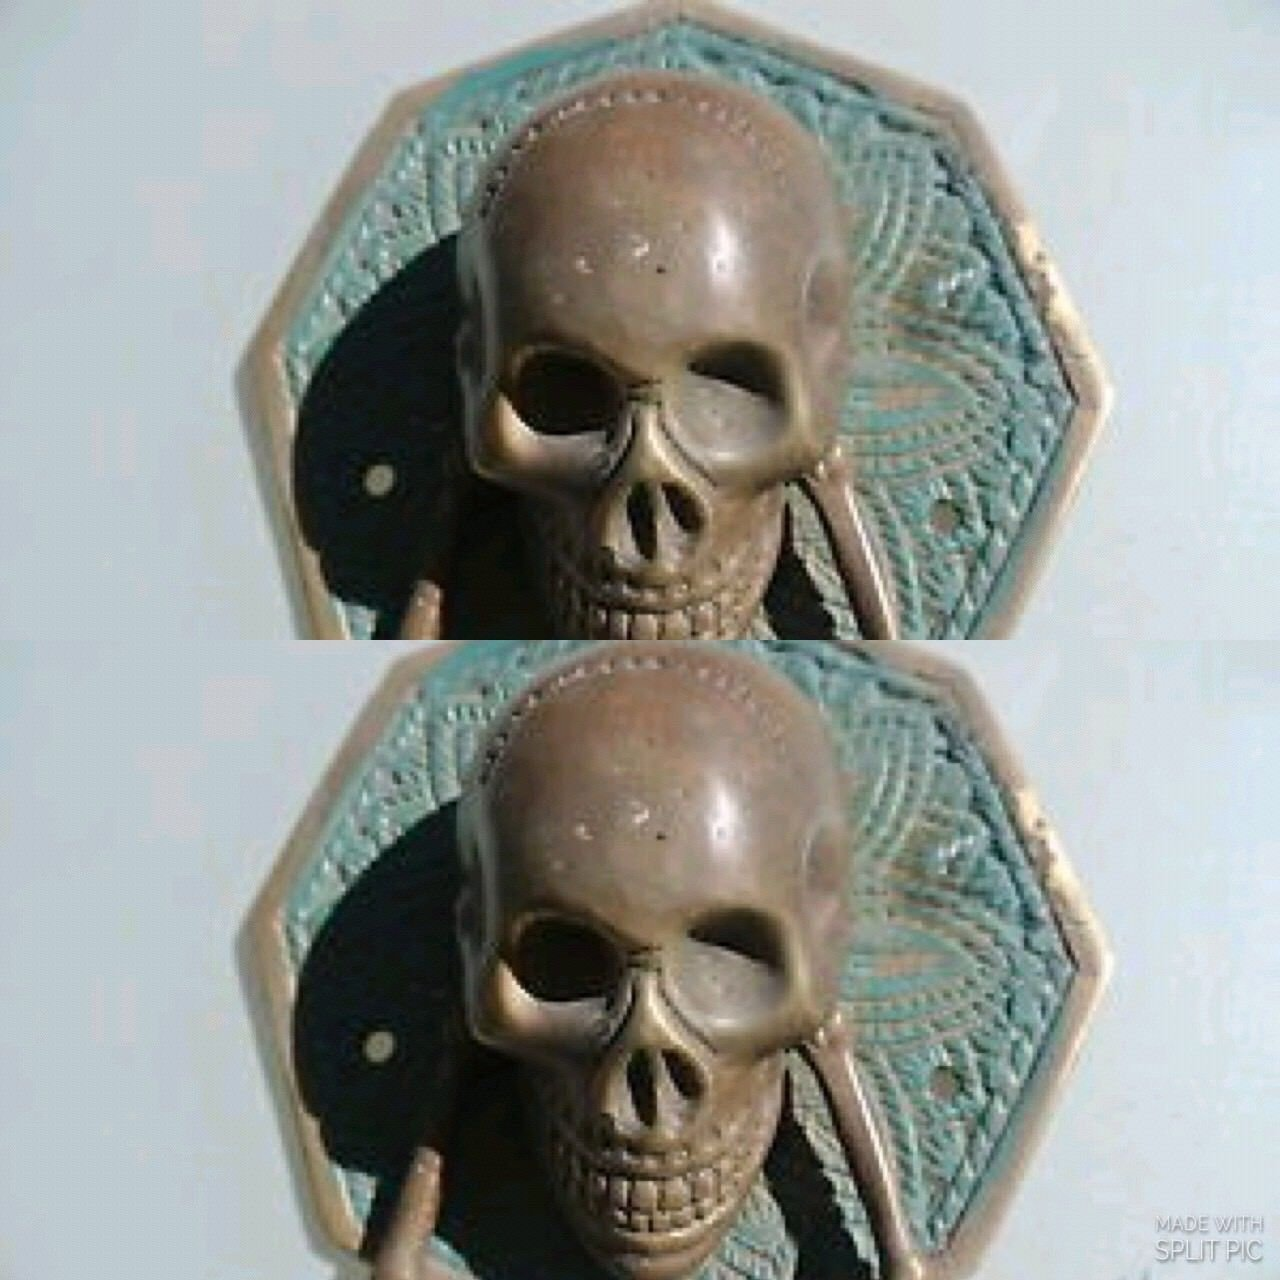 2 Large Skull Head Ring Pull Handle Pure Brass 4 Day Of The Dead Door Knocker Knocker Bronze Art Scary Decoration Interior Design Watson Brass Javanese Handicrafts Accessories